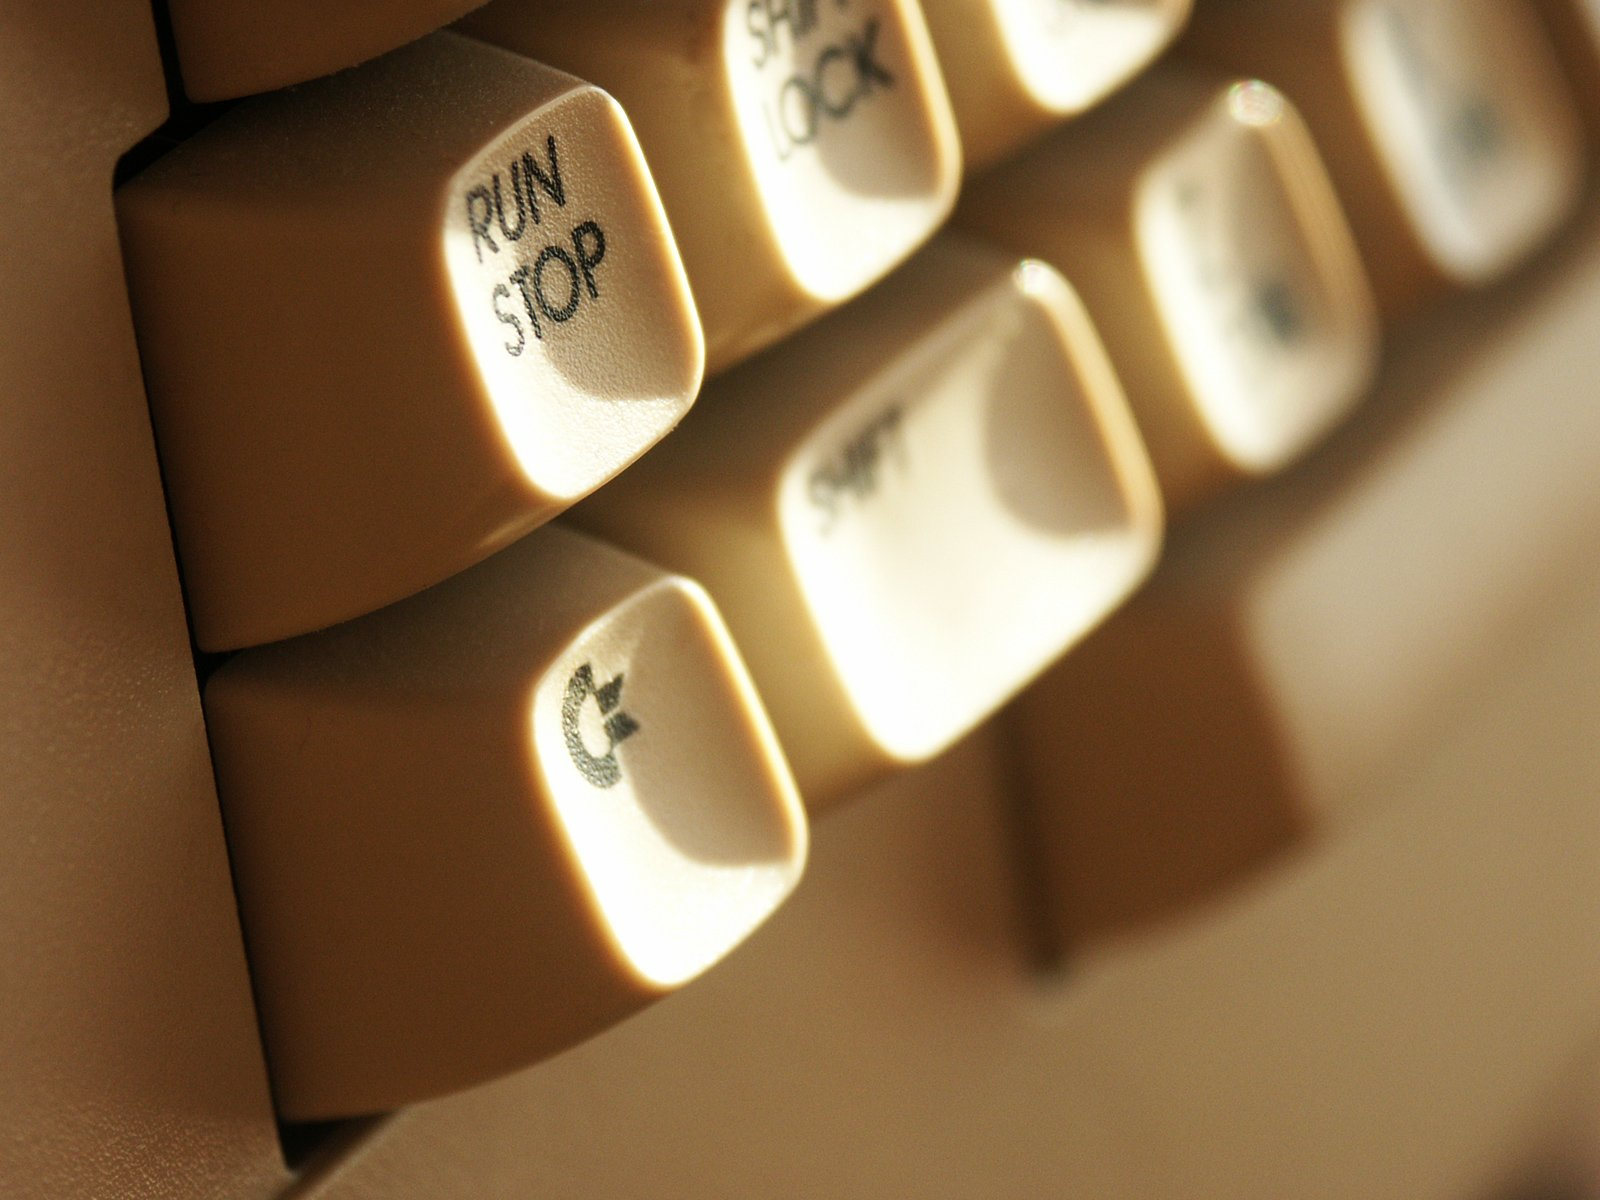 Odd keyboard